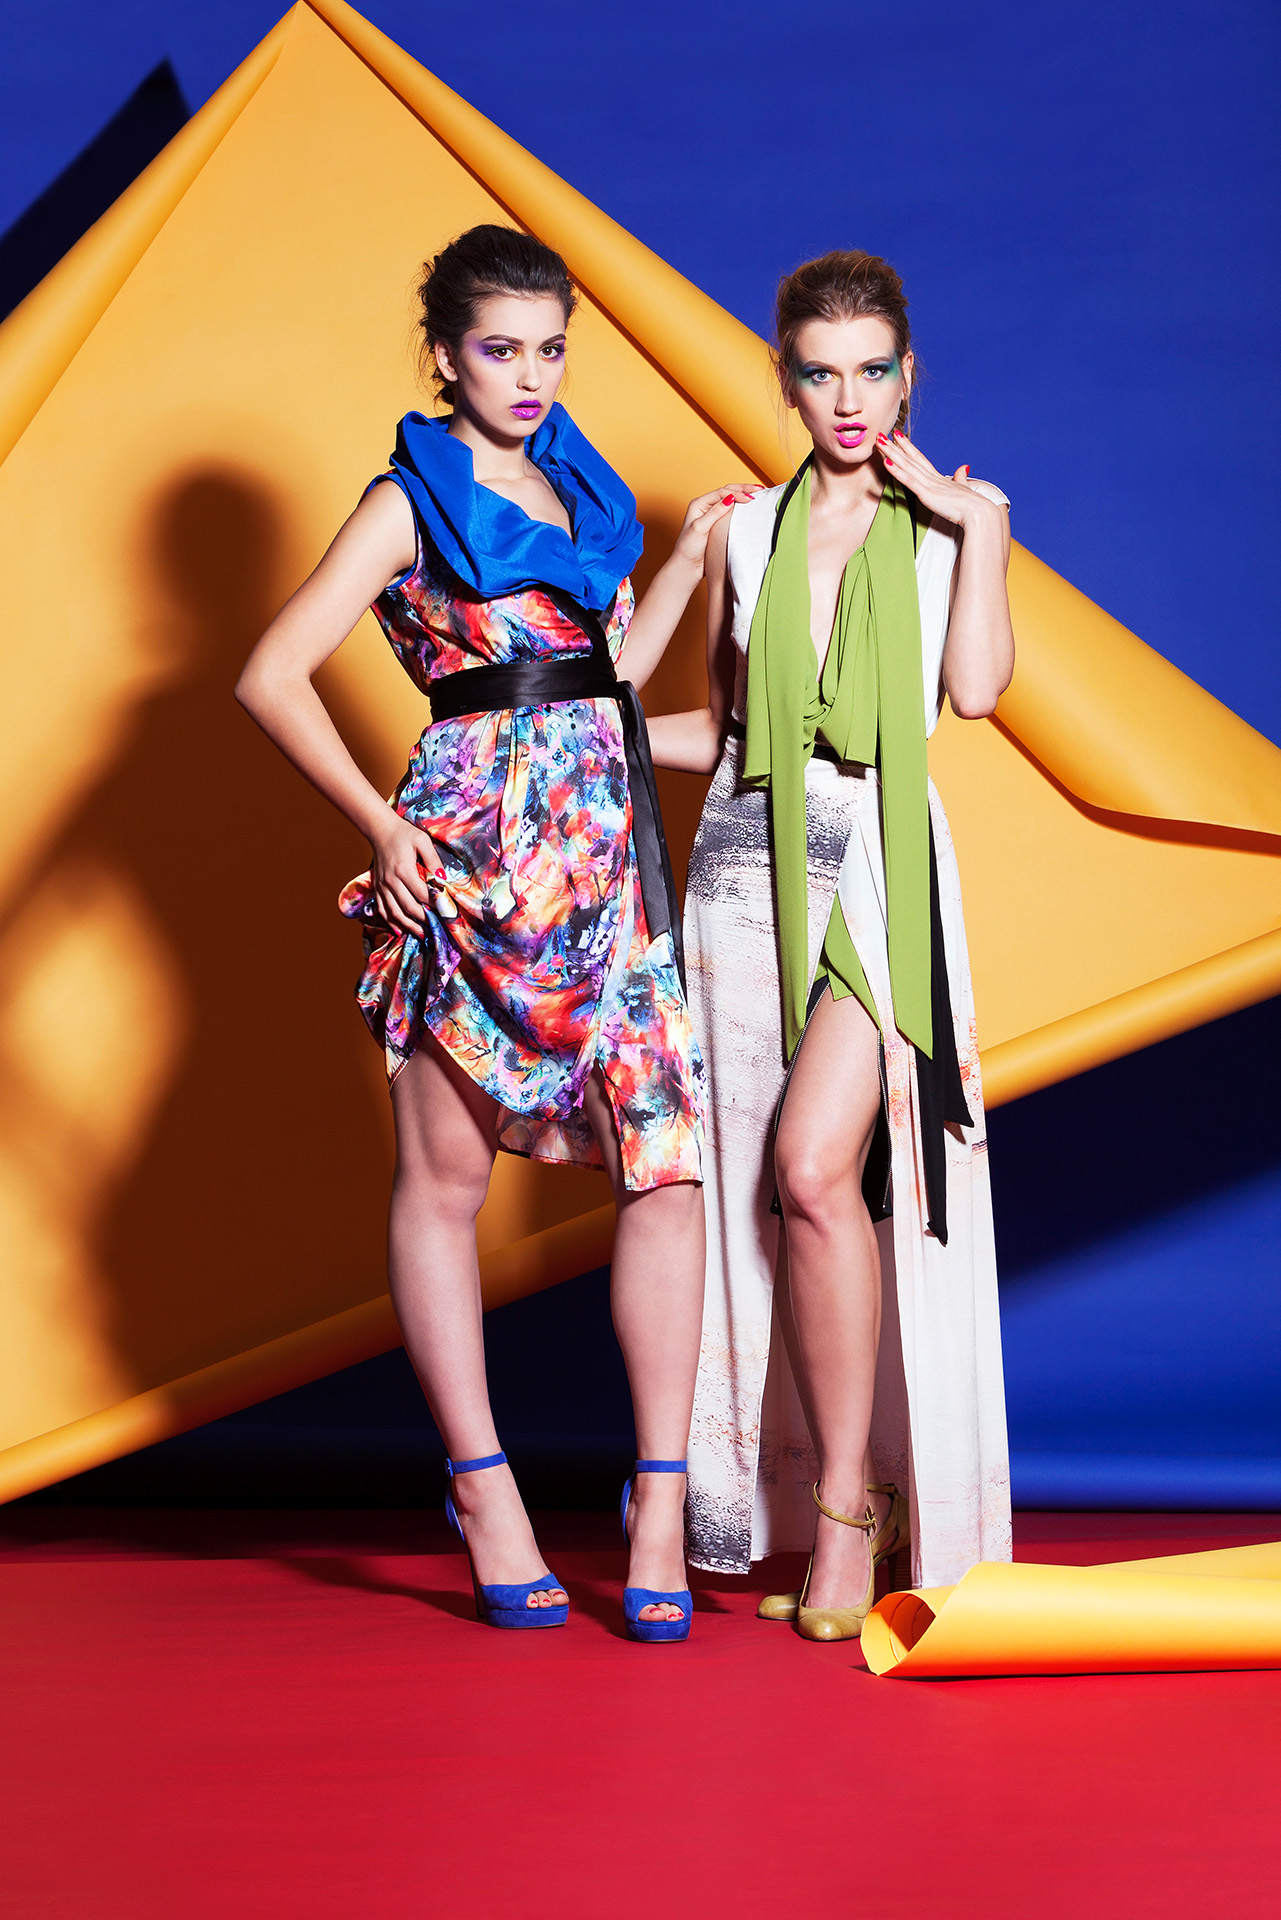 Yana Martens fashion model